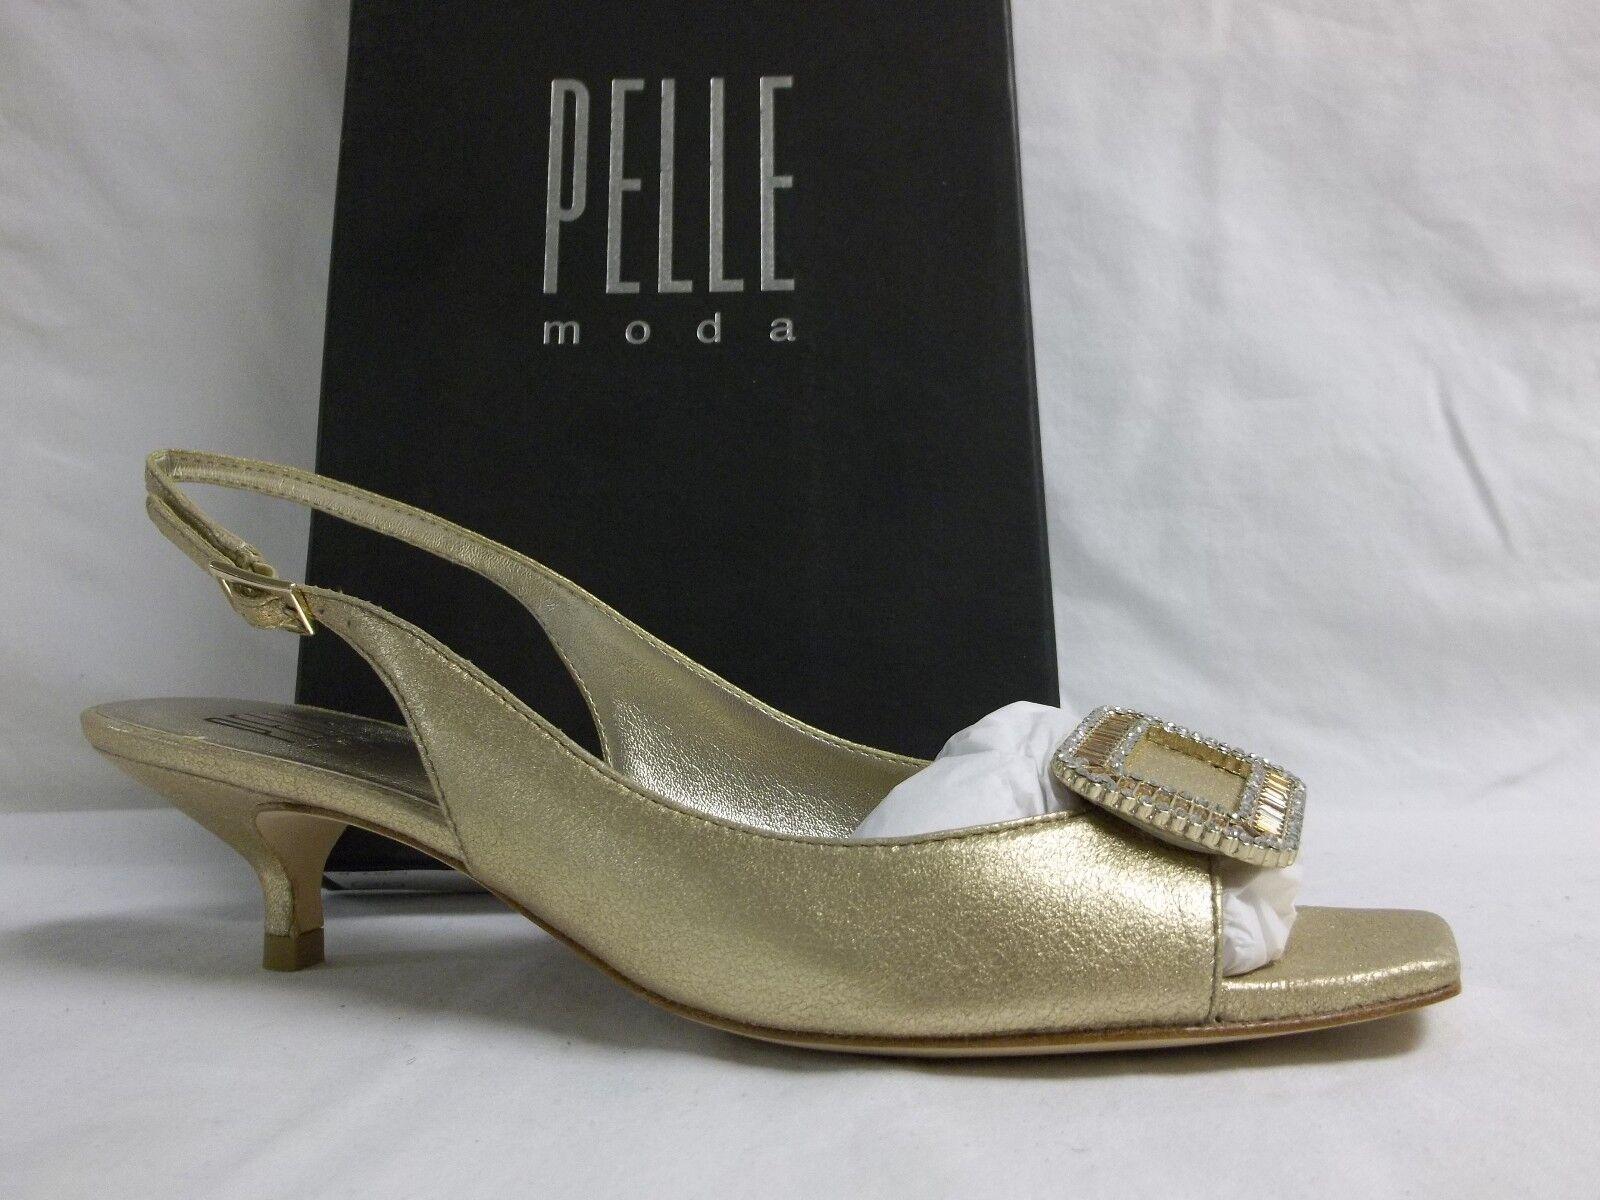 Pelle Moda Size 6.5 M Fresh Platinum Gold Leather Kitten Heels New Womens Shoes